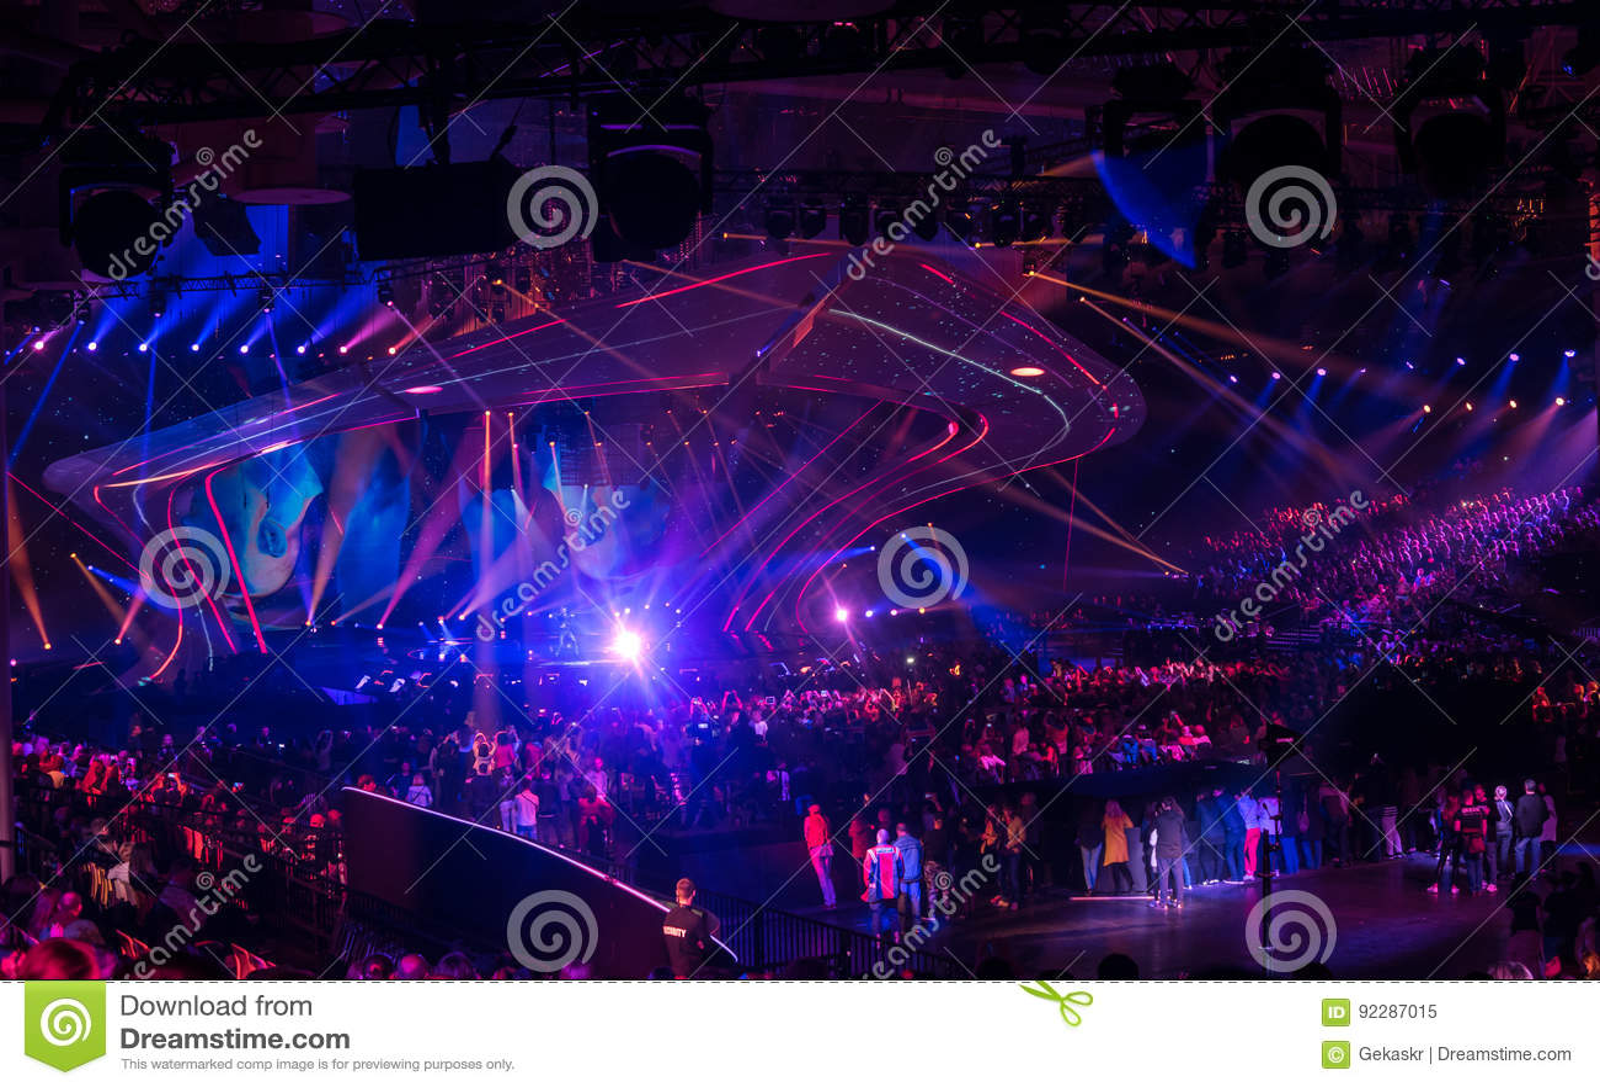 Eurovision 2017 in Ukraine